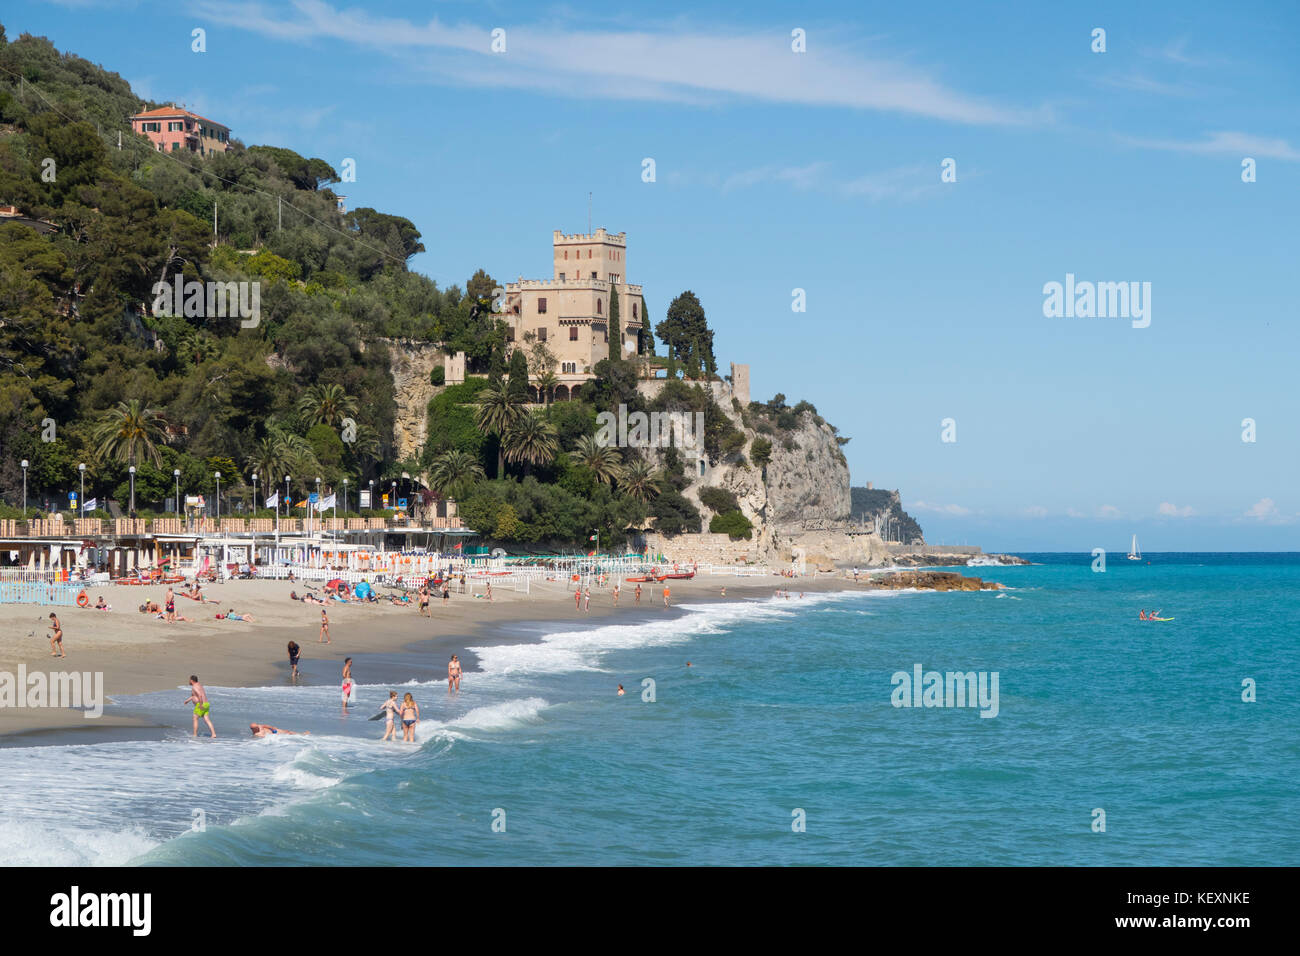 The beach of Finale Marina in Italian holiday region Finale Ligure at the Mediterranean Sea. - Stock Image